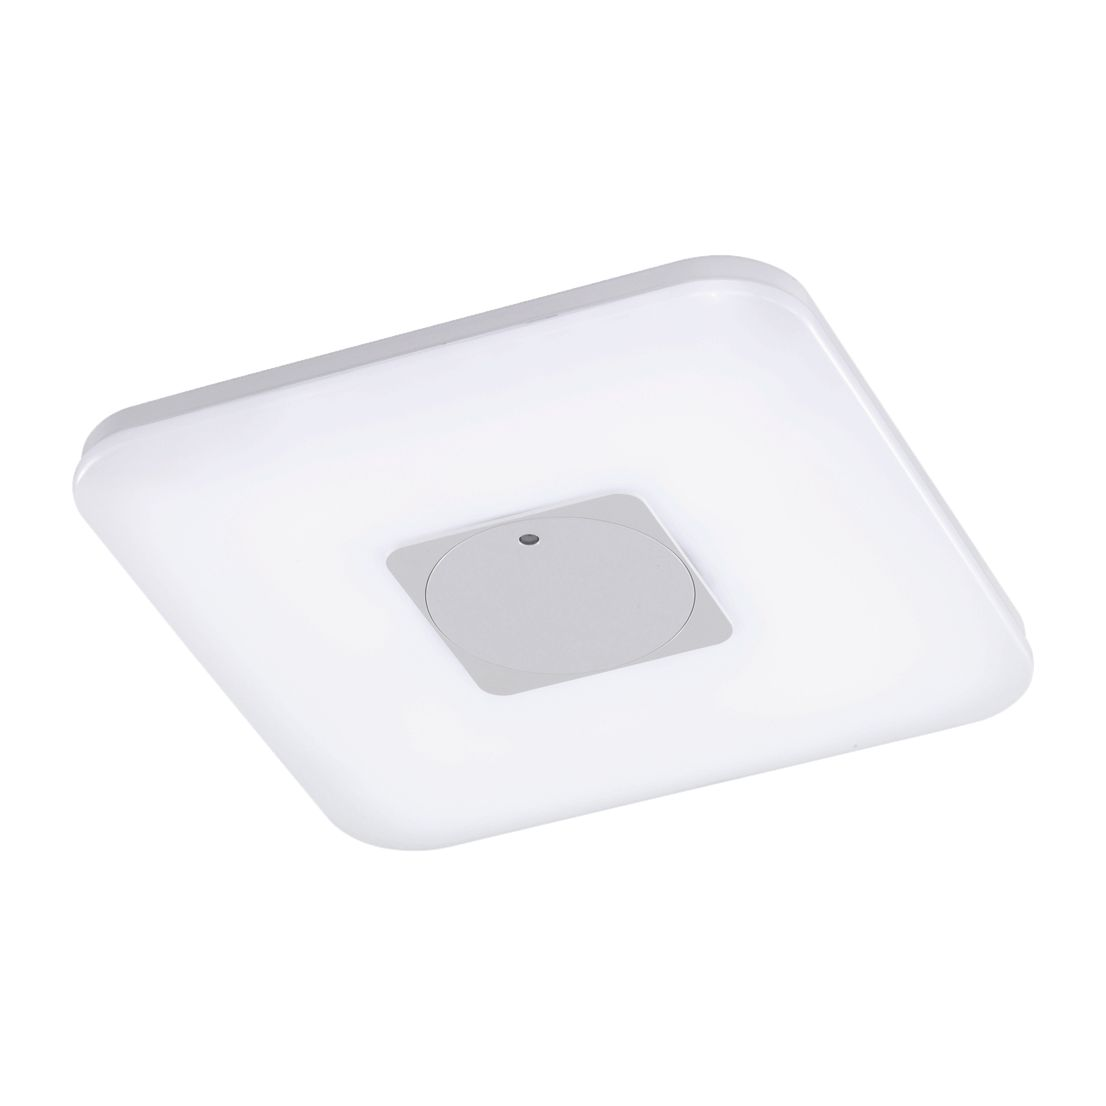 EEK A+, LED-Deckenleuchte Chamäleon 40 cm breit - Weiß Matt - 1-flammig, Honsel